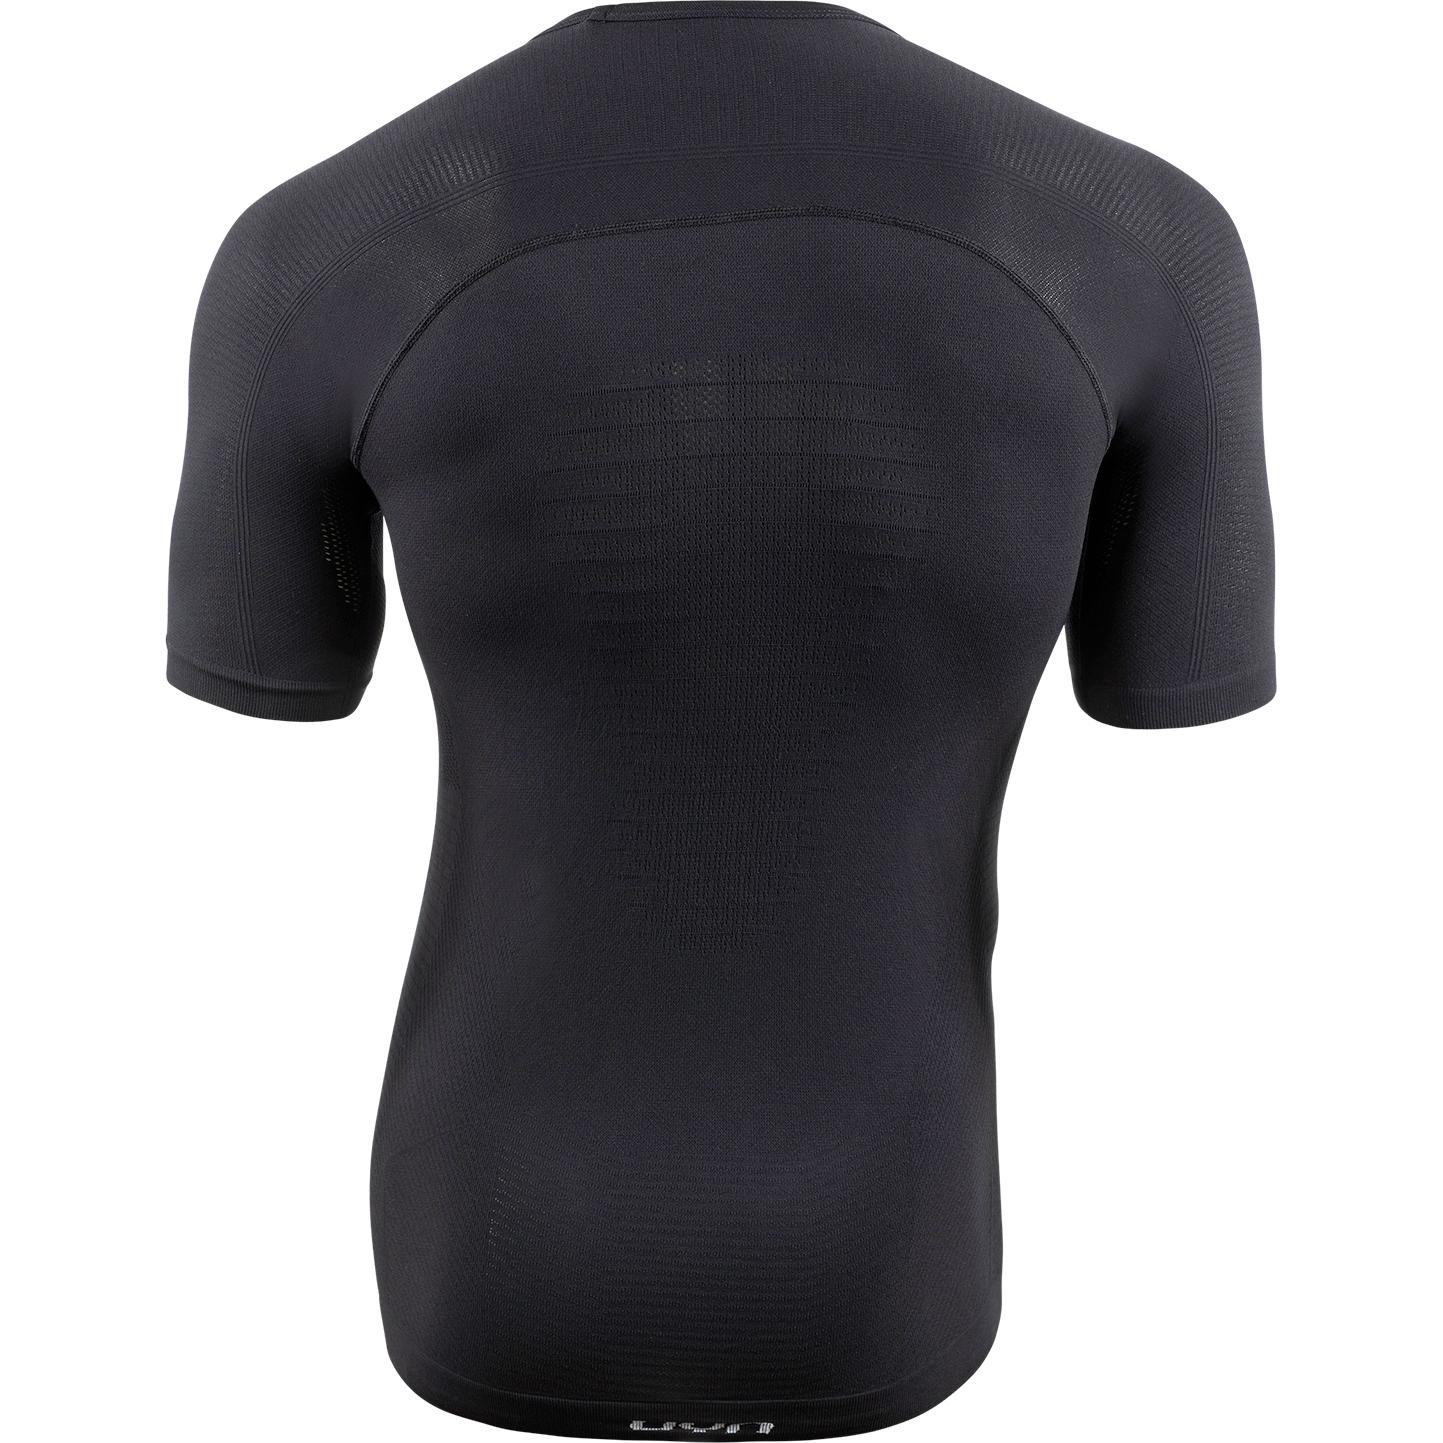 Image of UYN Energyon Underwear T-Shirt - Black